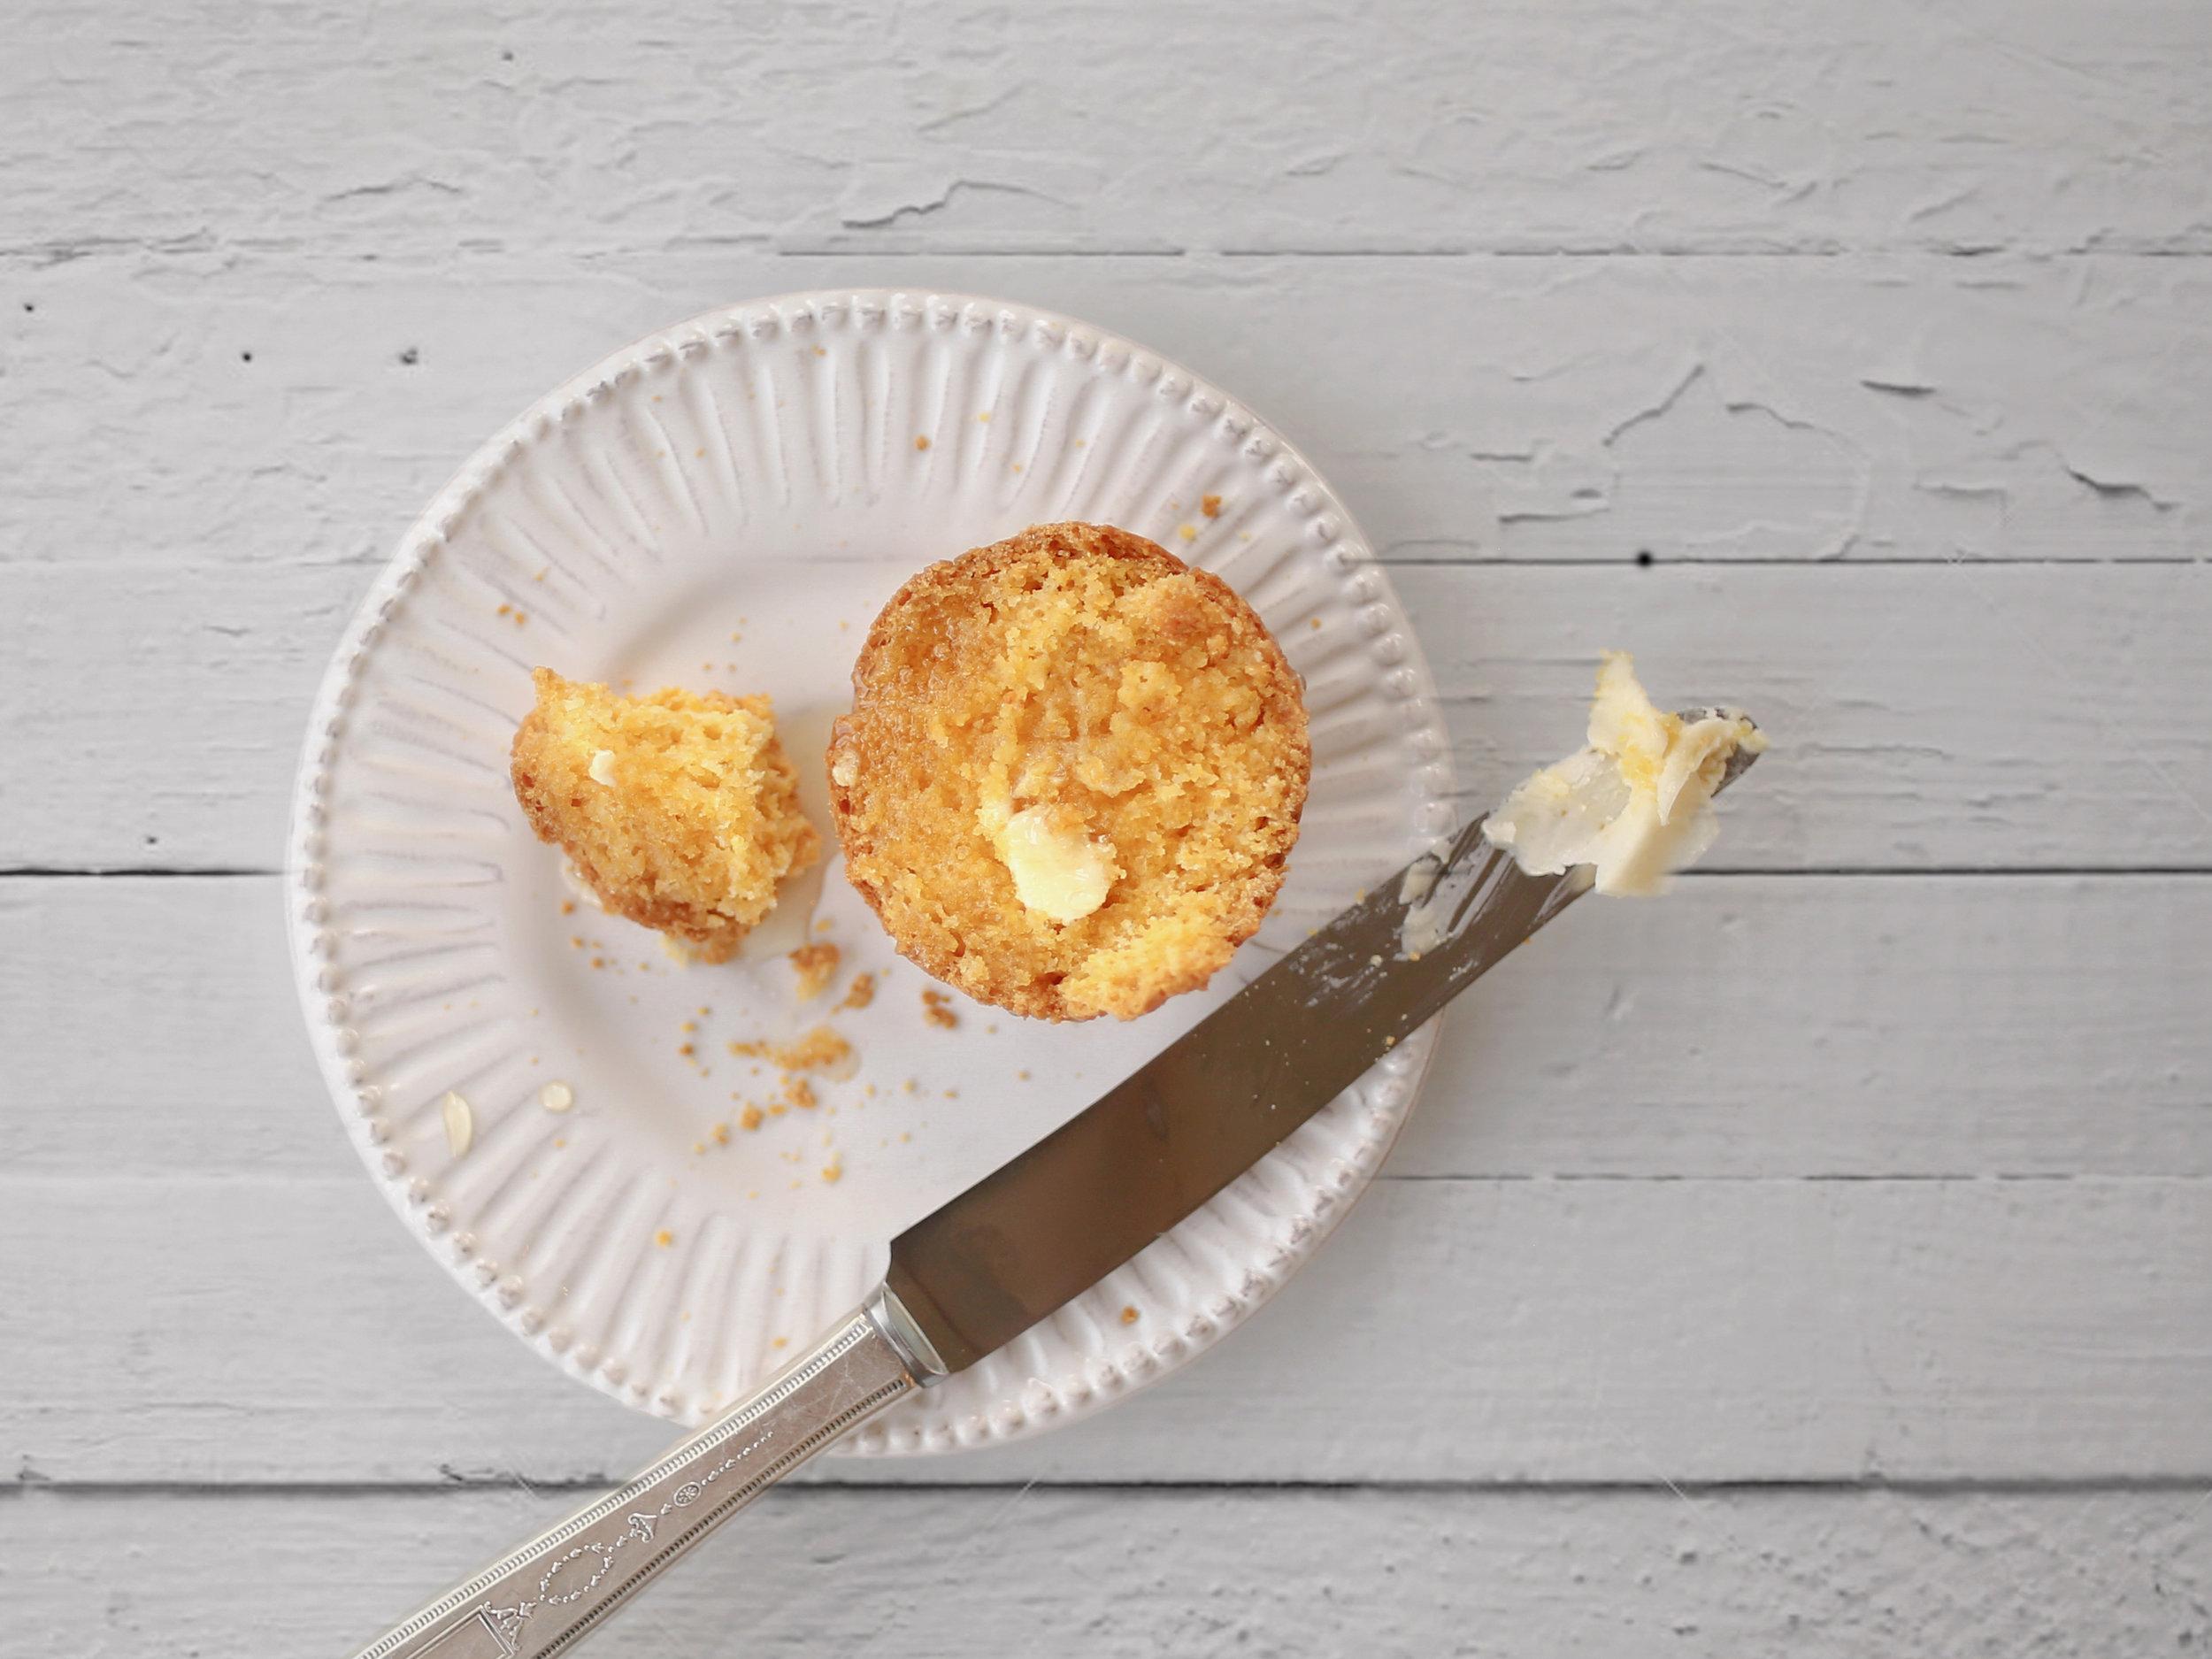 laurennicolefoot-2018-october-cornmealmuffins-15_2 copy.jpg